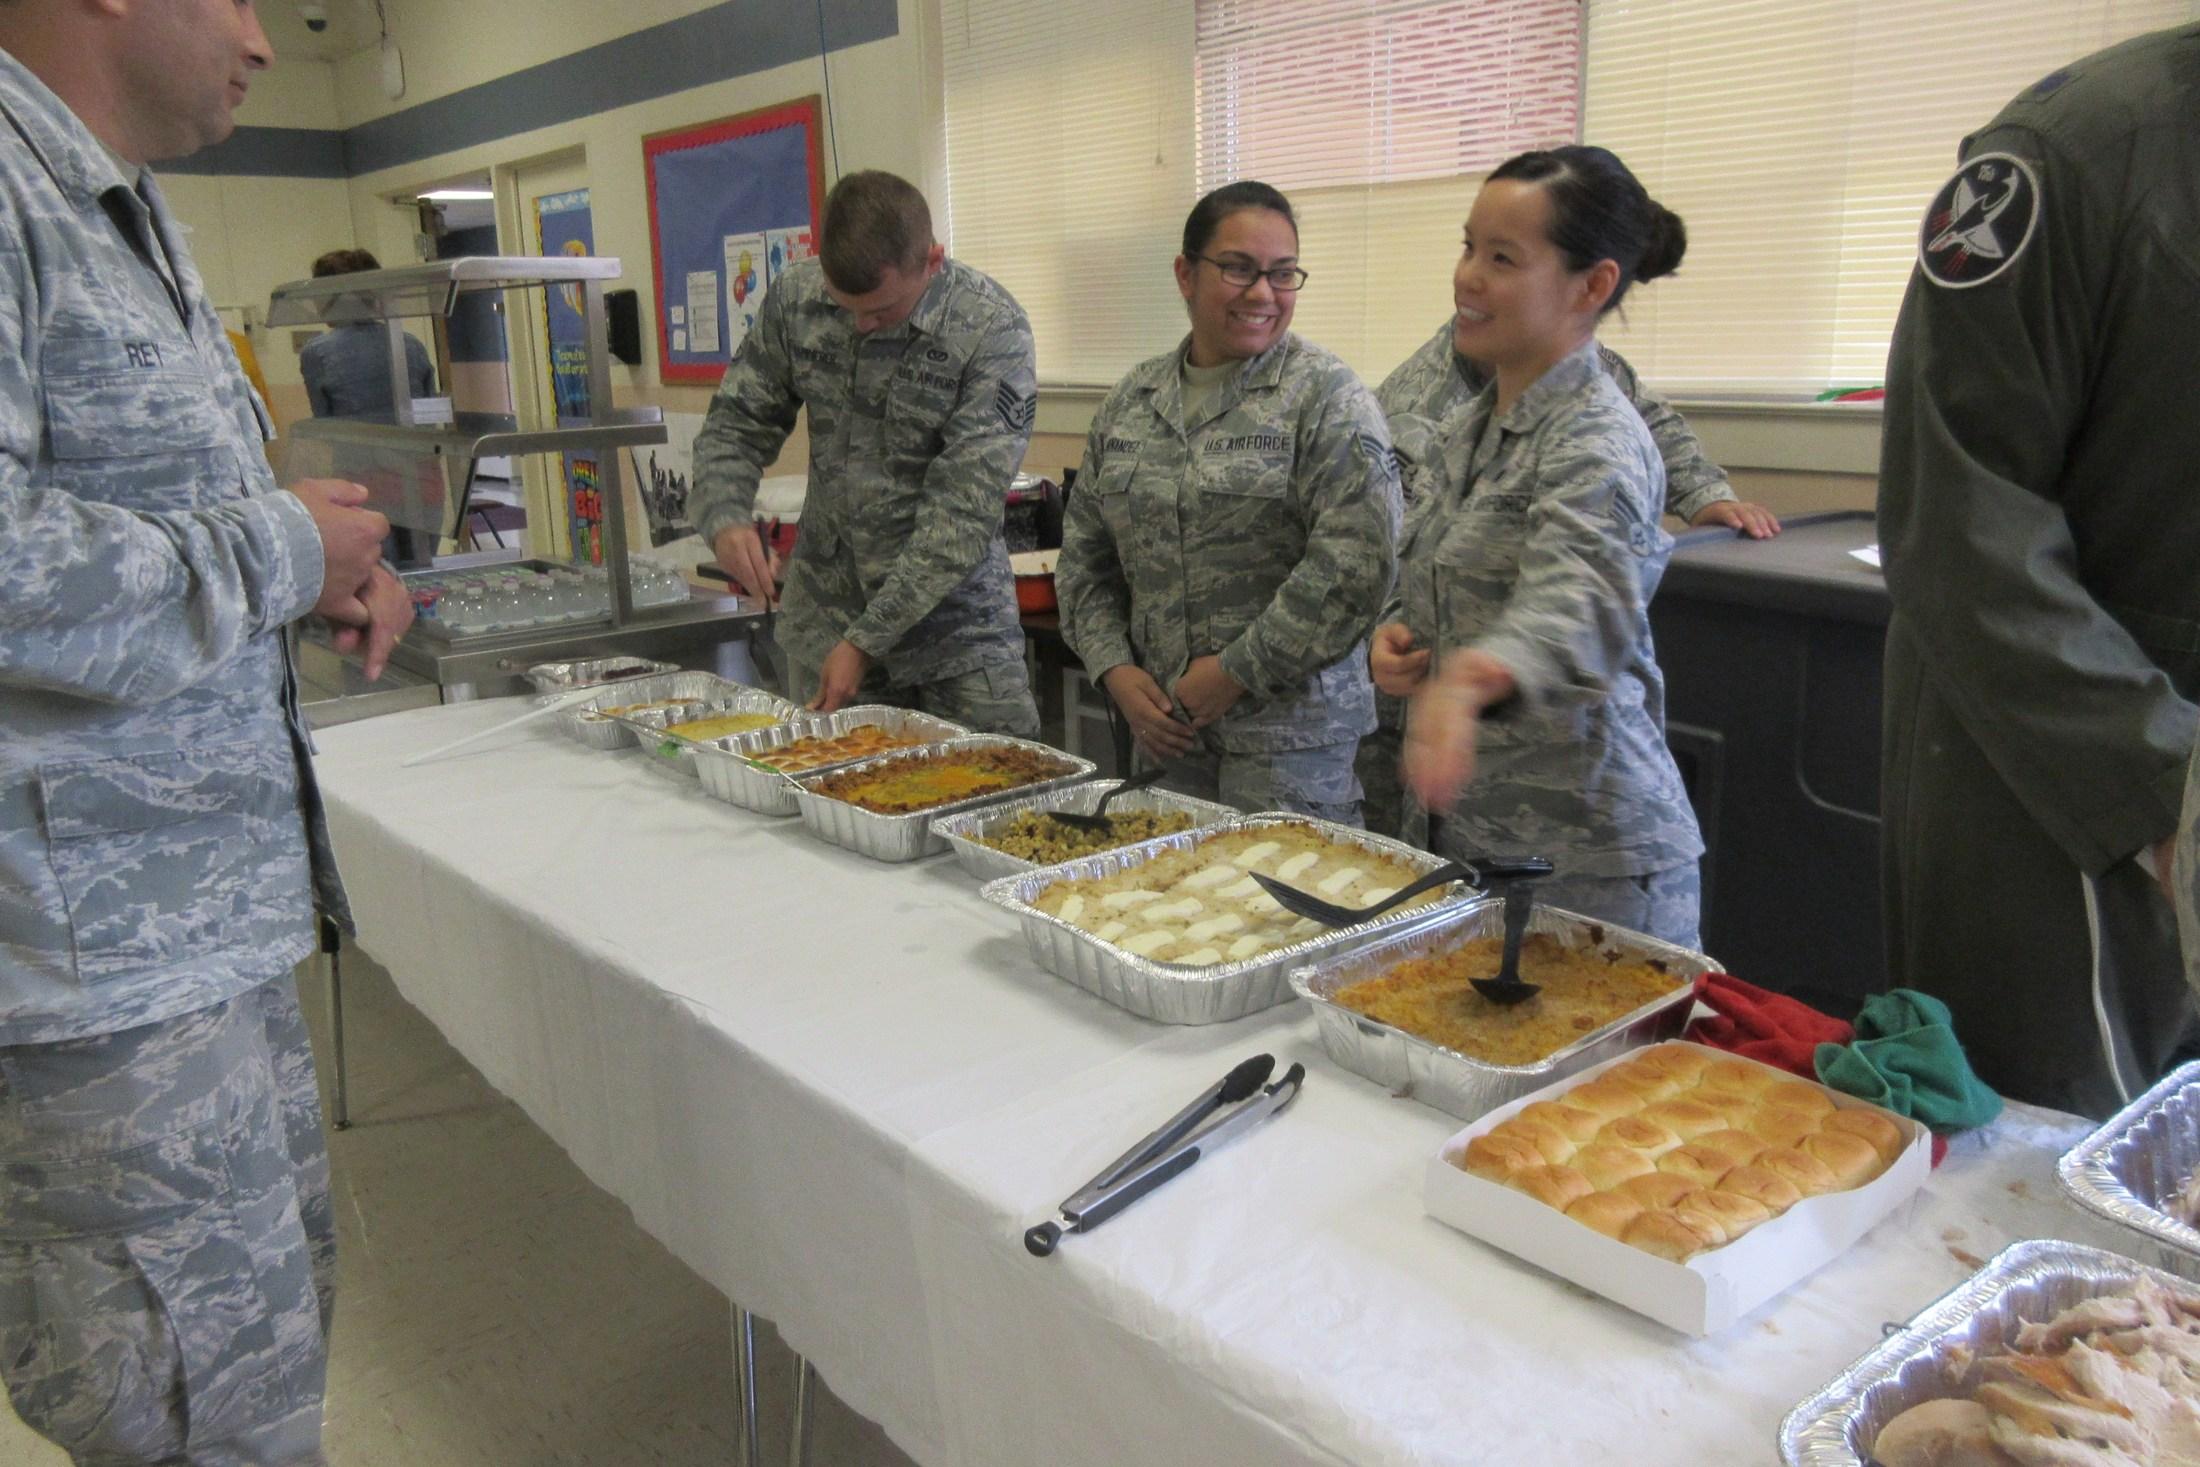 Airmen serving students